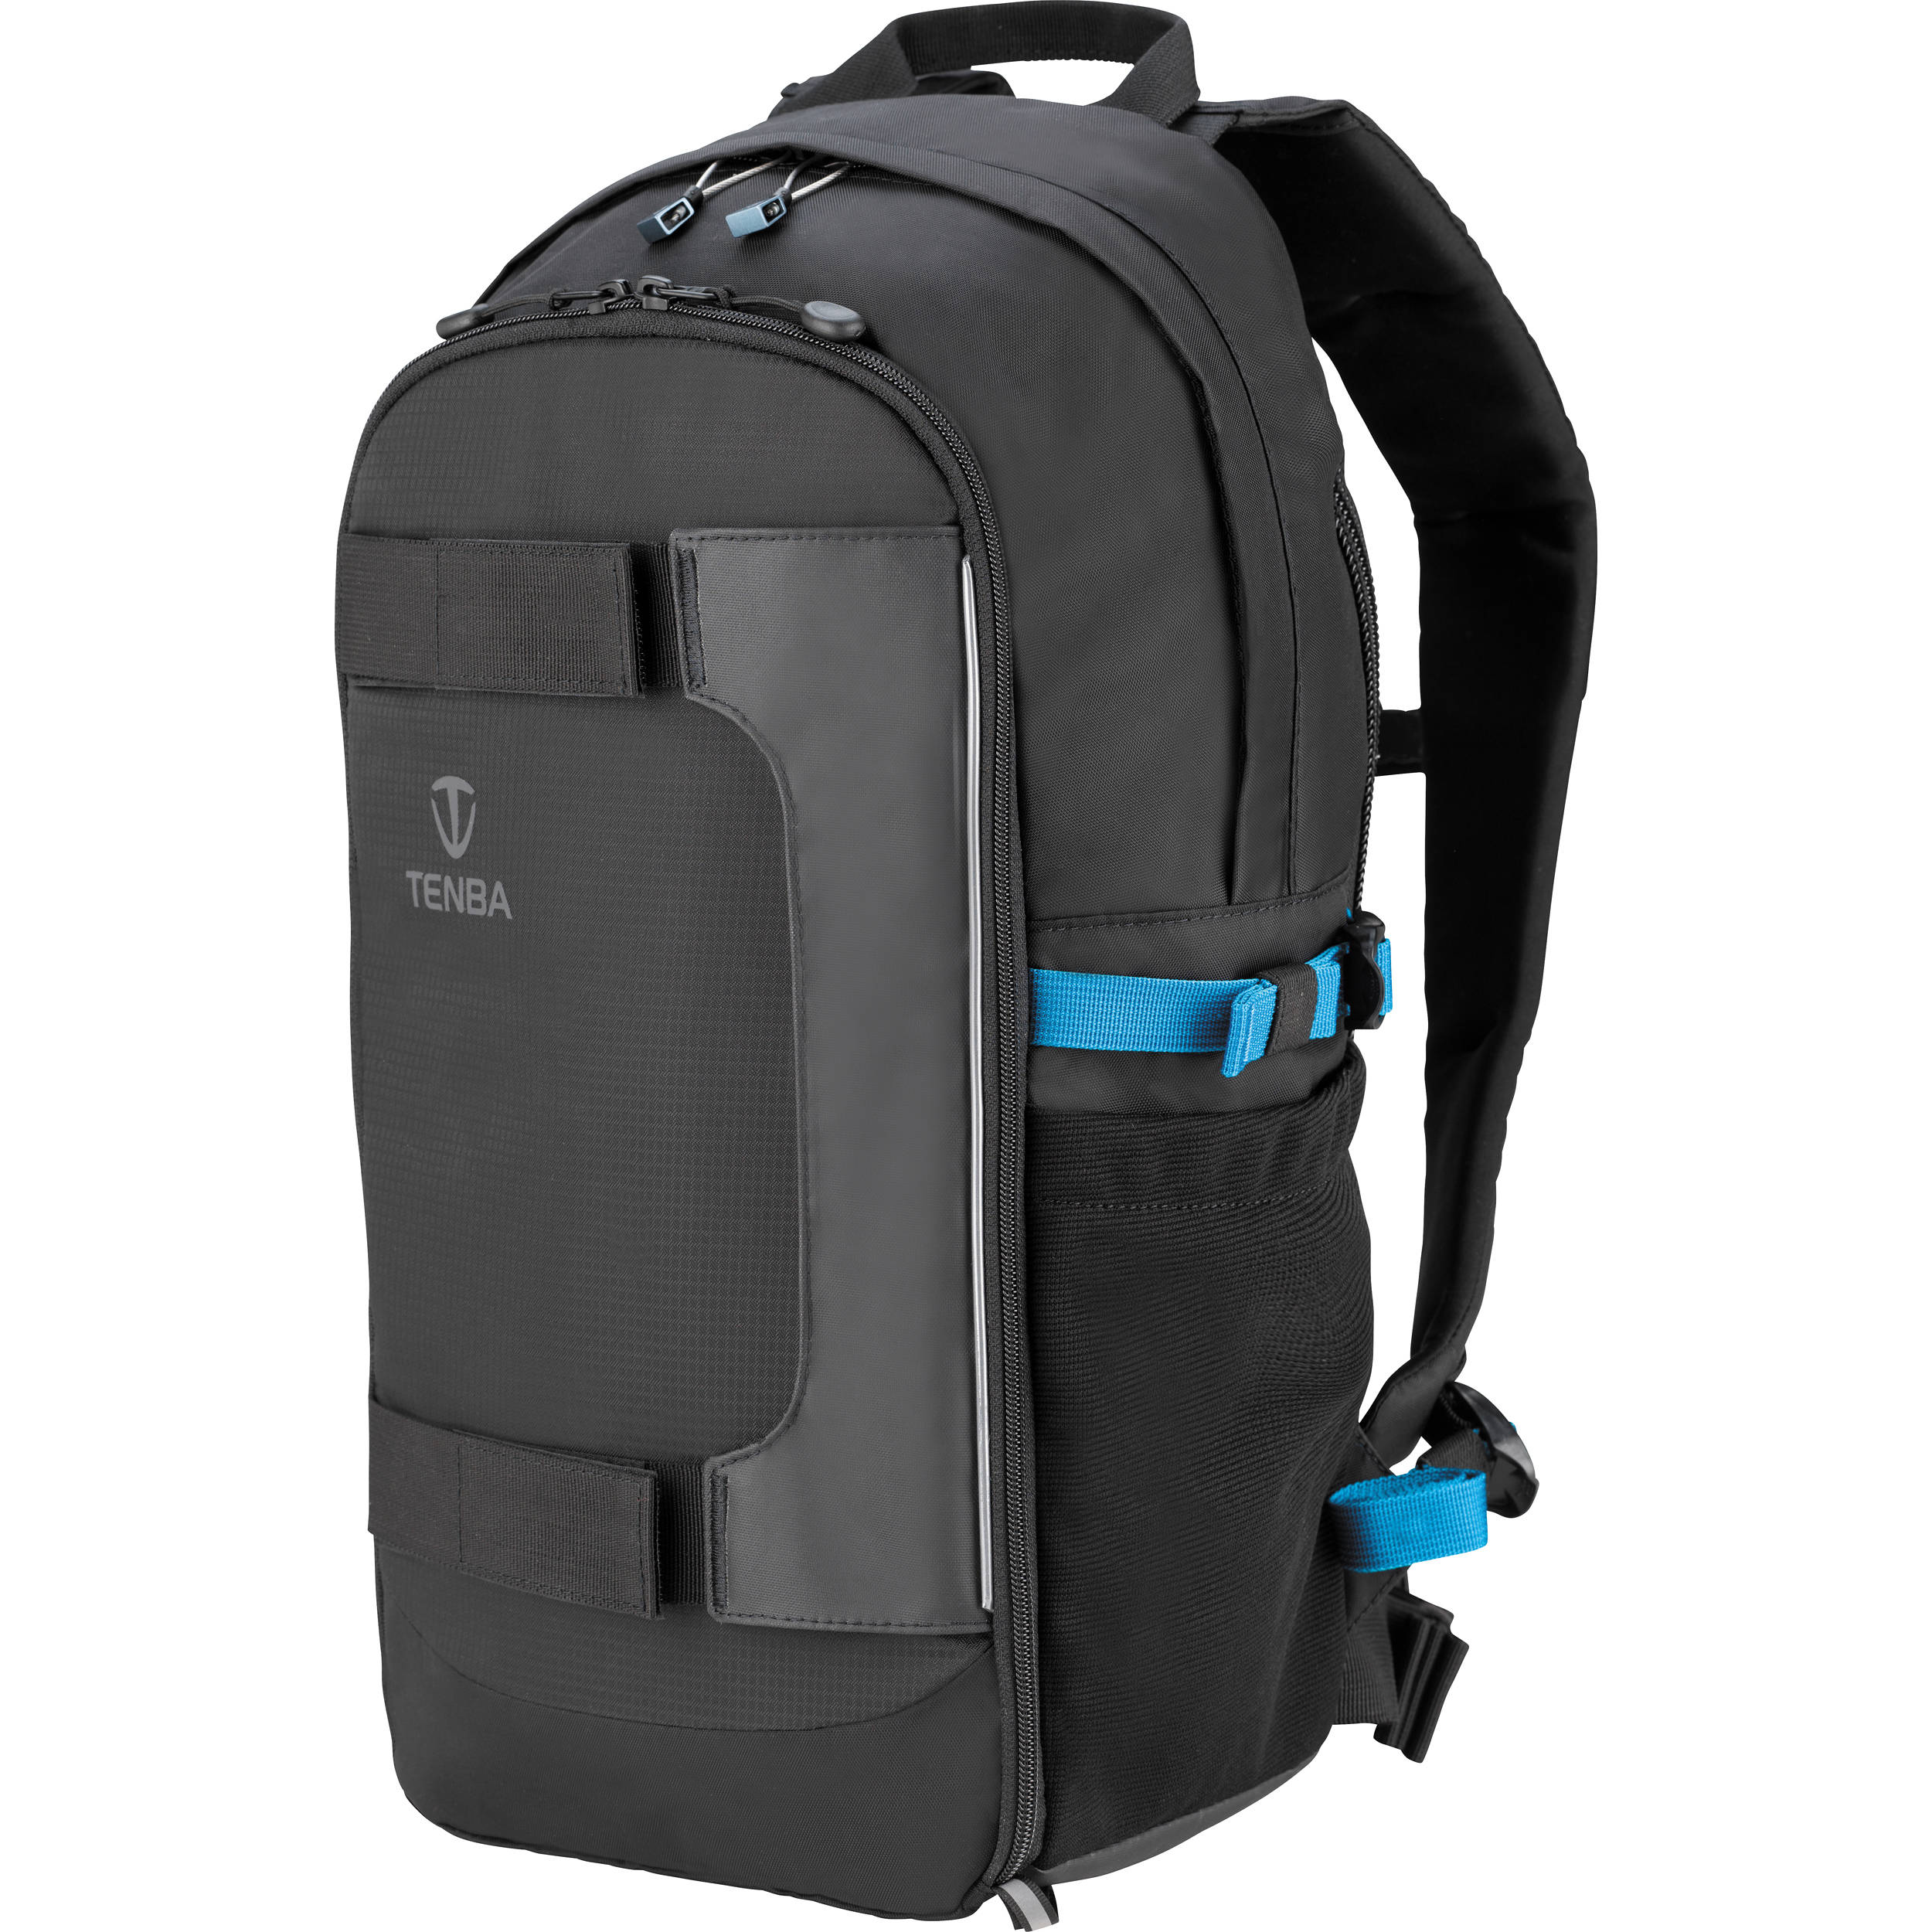 Ultimate Tas Laptop Bentuk Softcase Classic Notebook 116 Hitam Inch Source Harga Tenba 632 441 12l Actionpack For Gopro 1089753